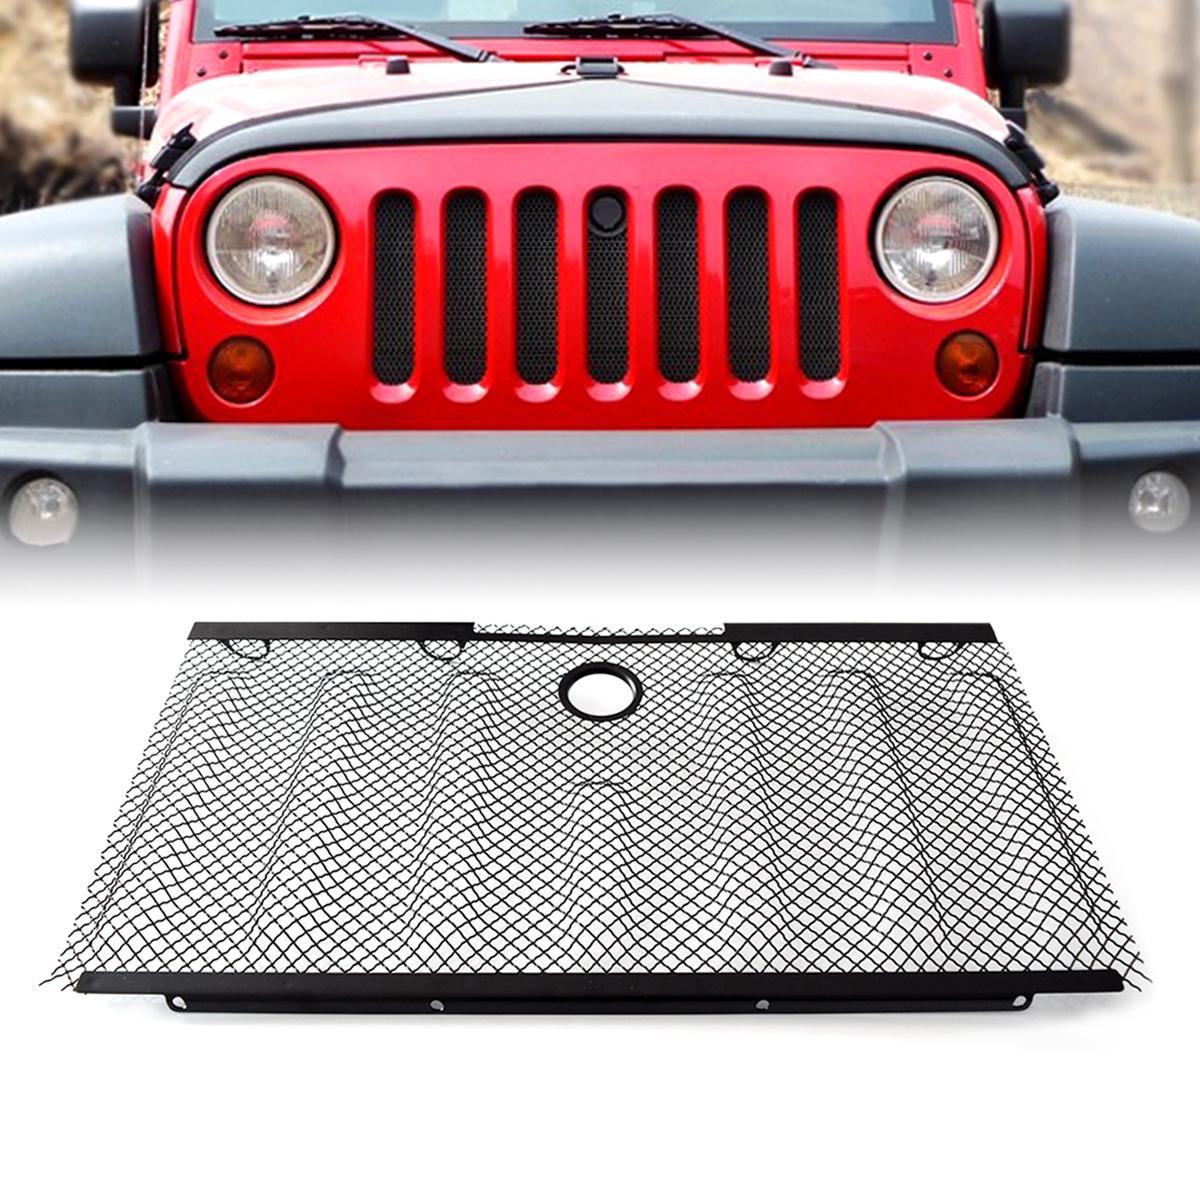 hight resolution of front grille insert 3d bug net 2 4 doors jeep wrangler 2007 2015 jk jku